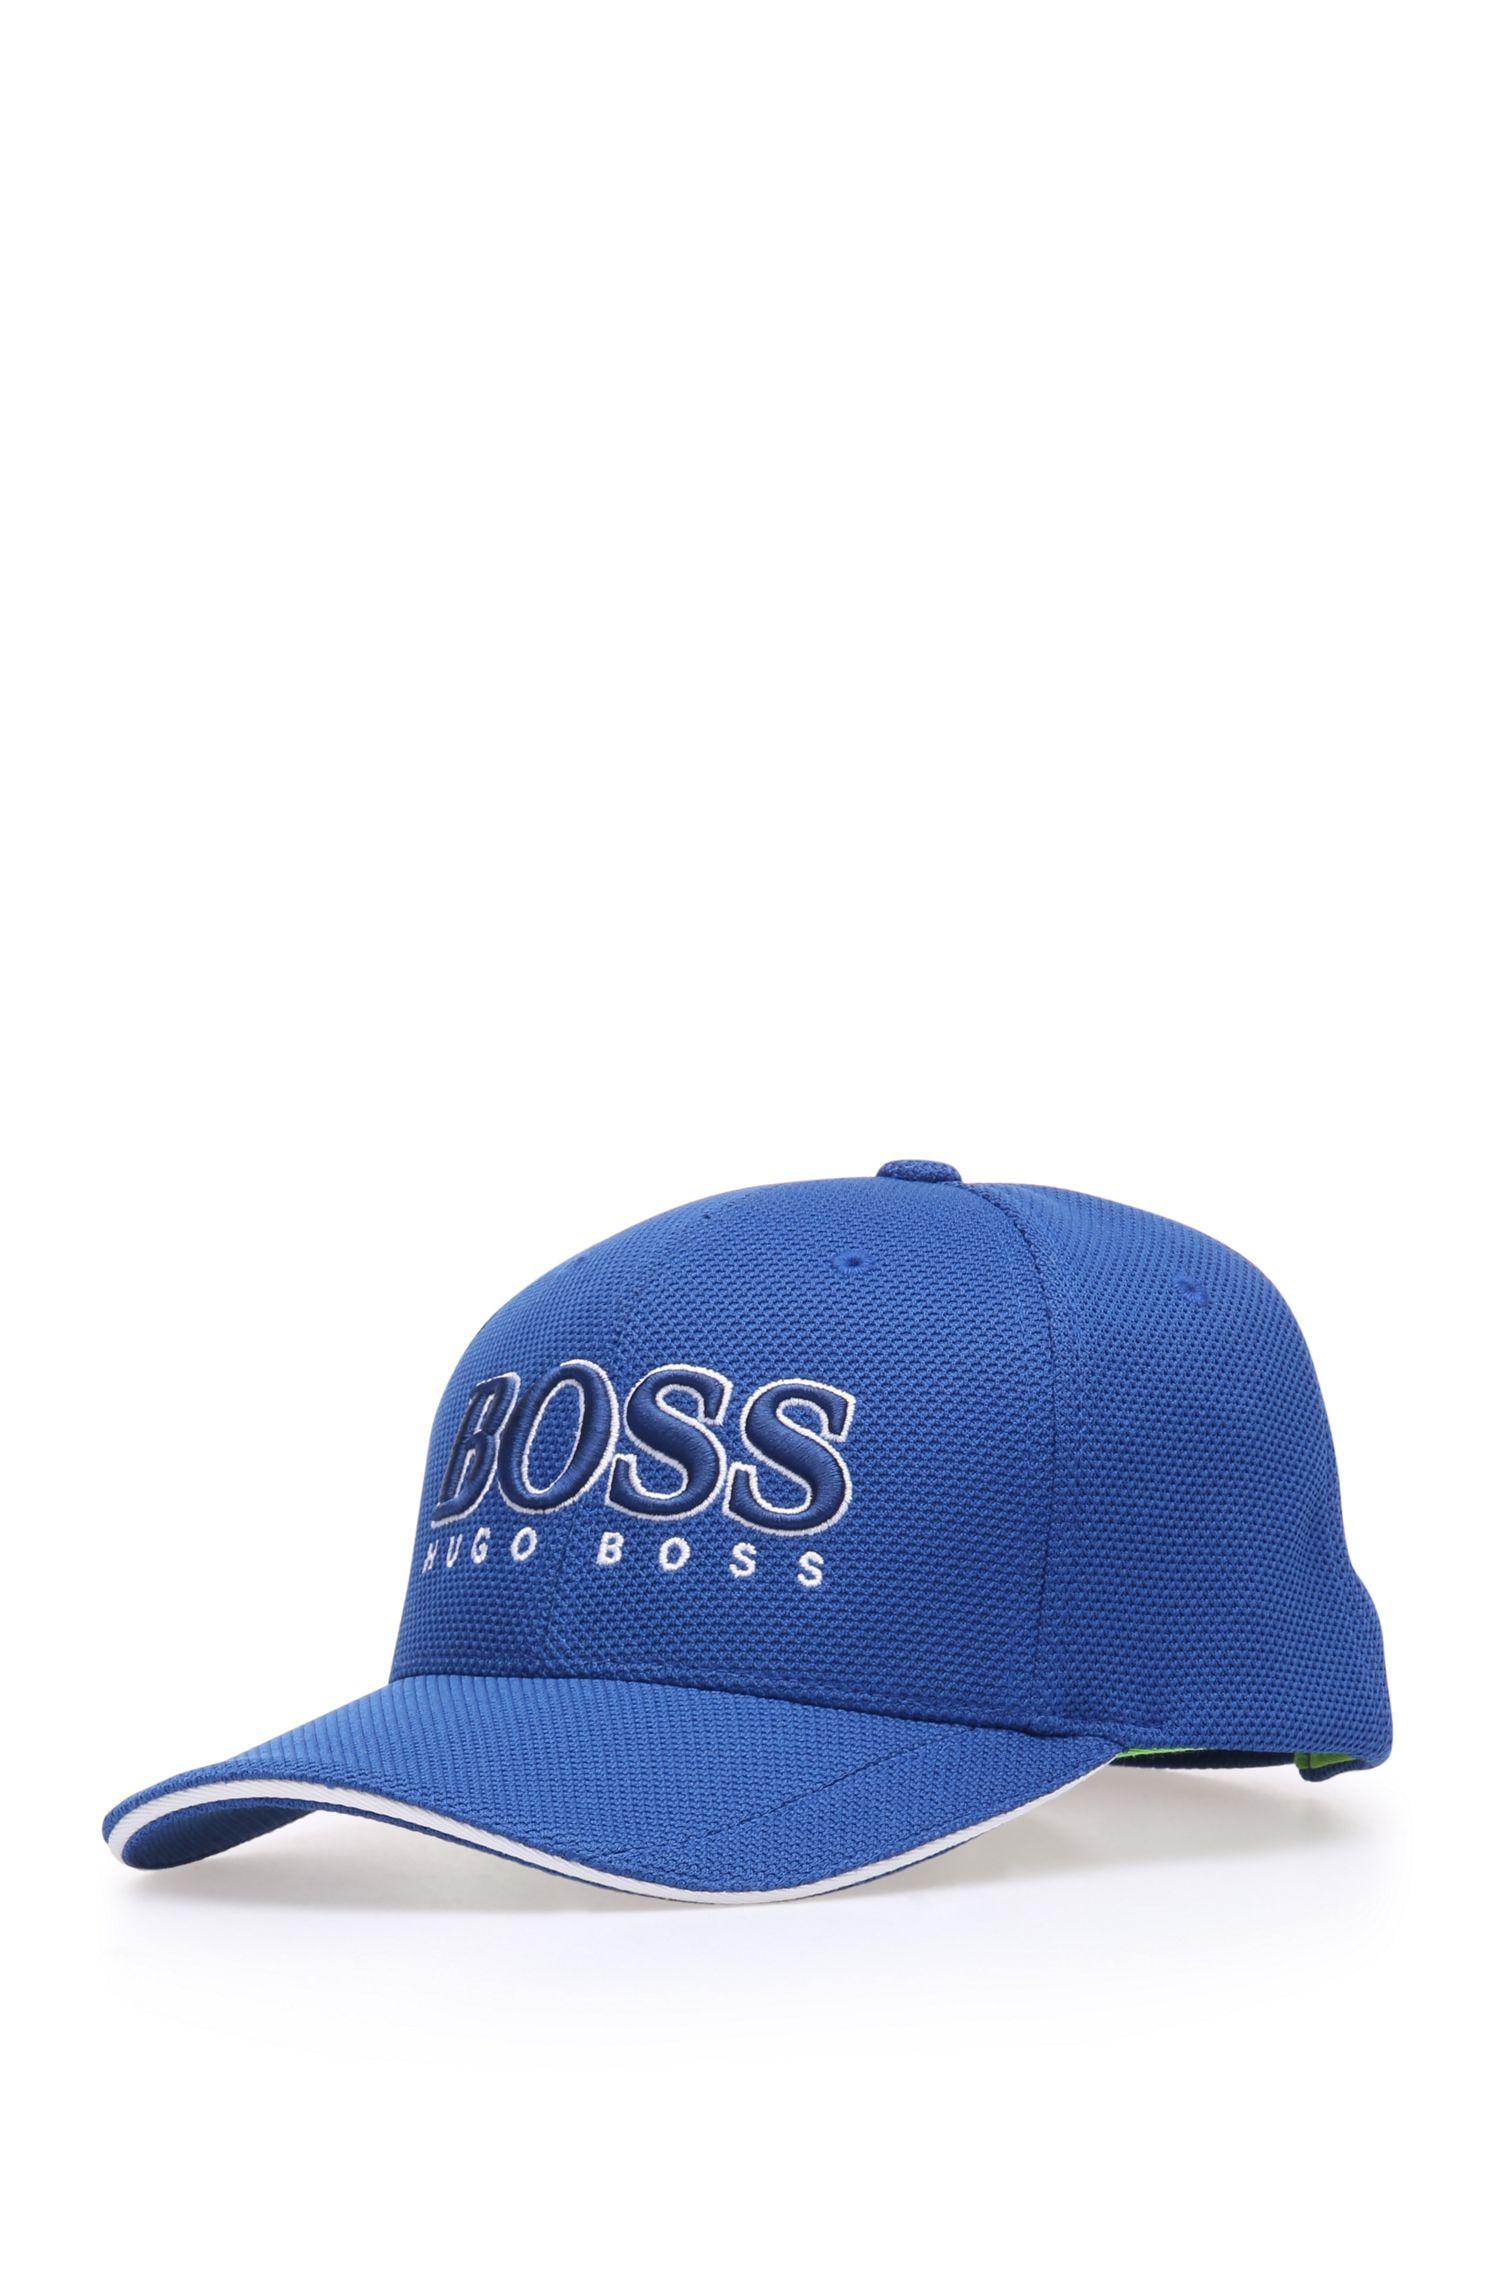 3-D Logo Performance Hat | Cap US